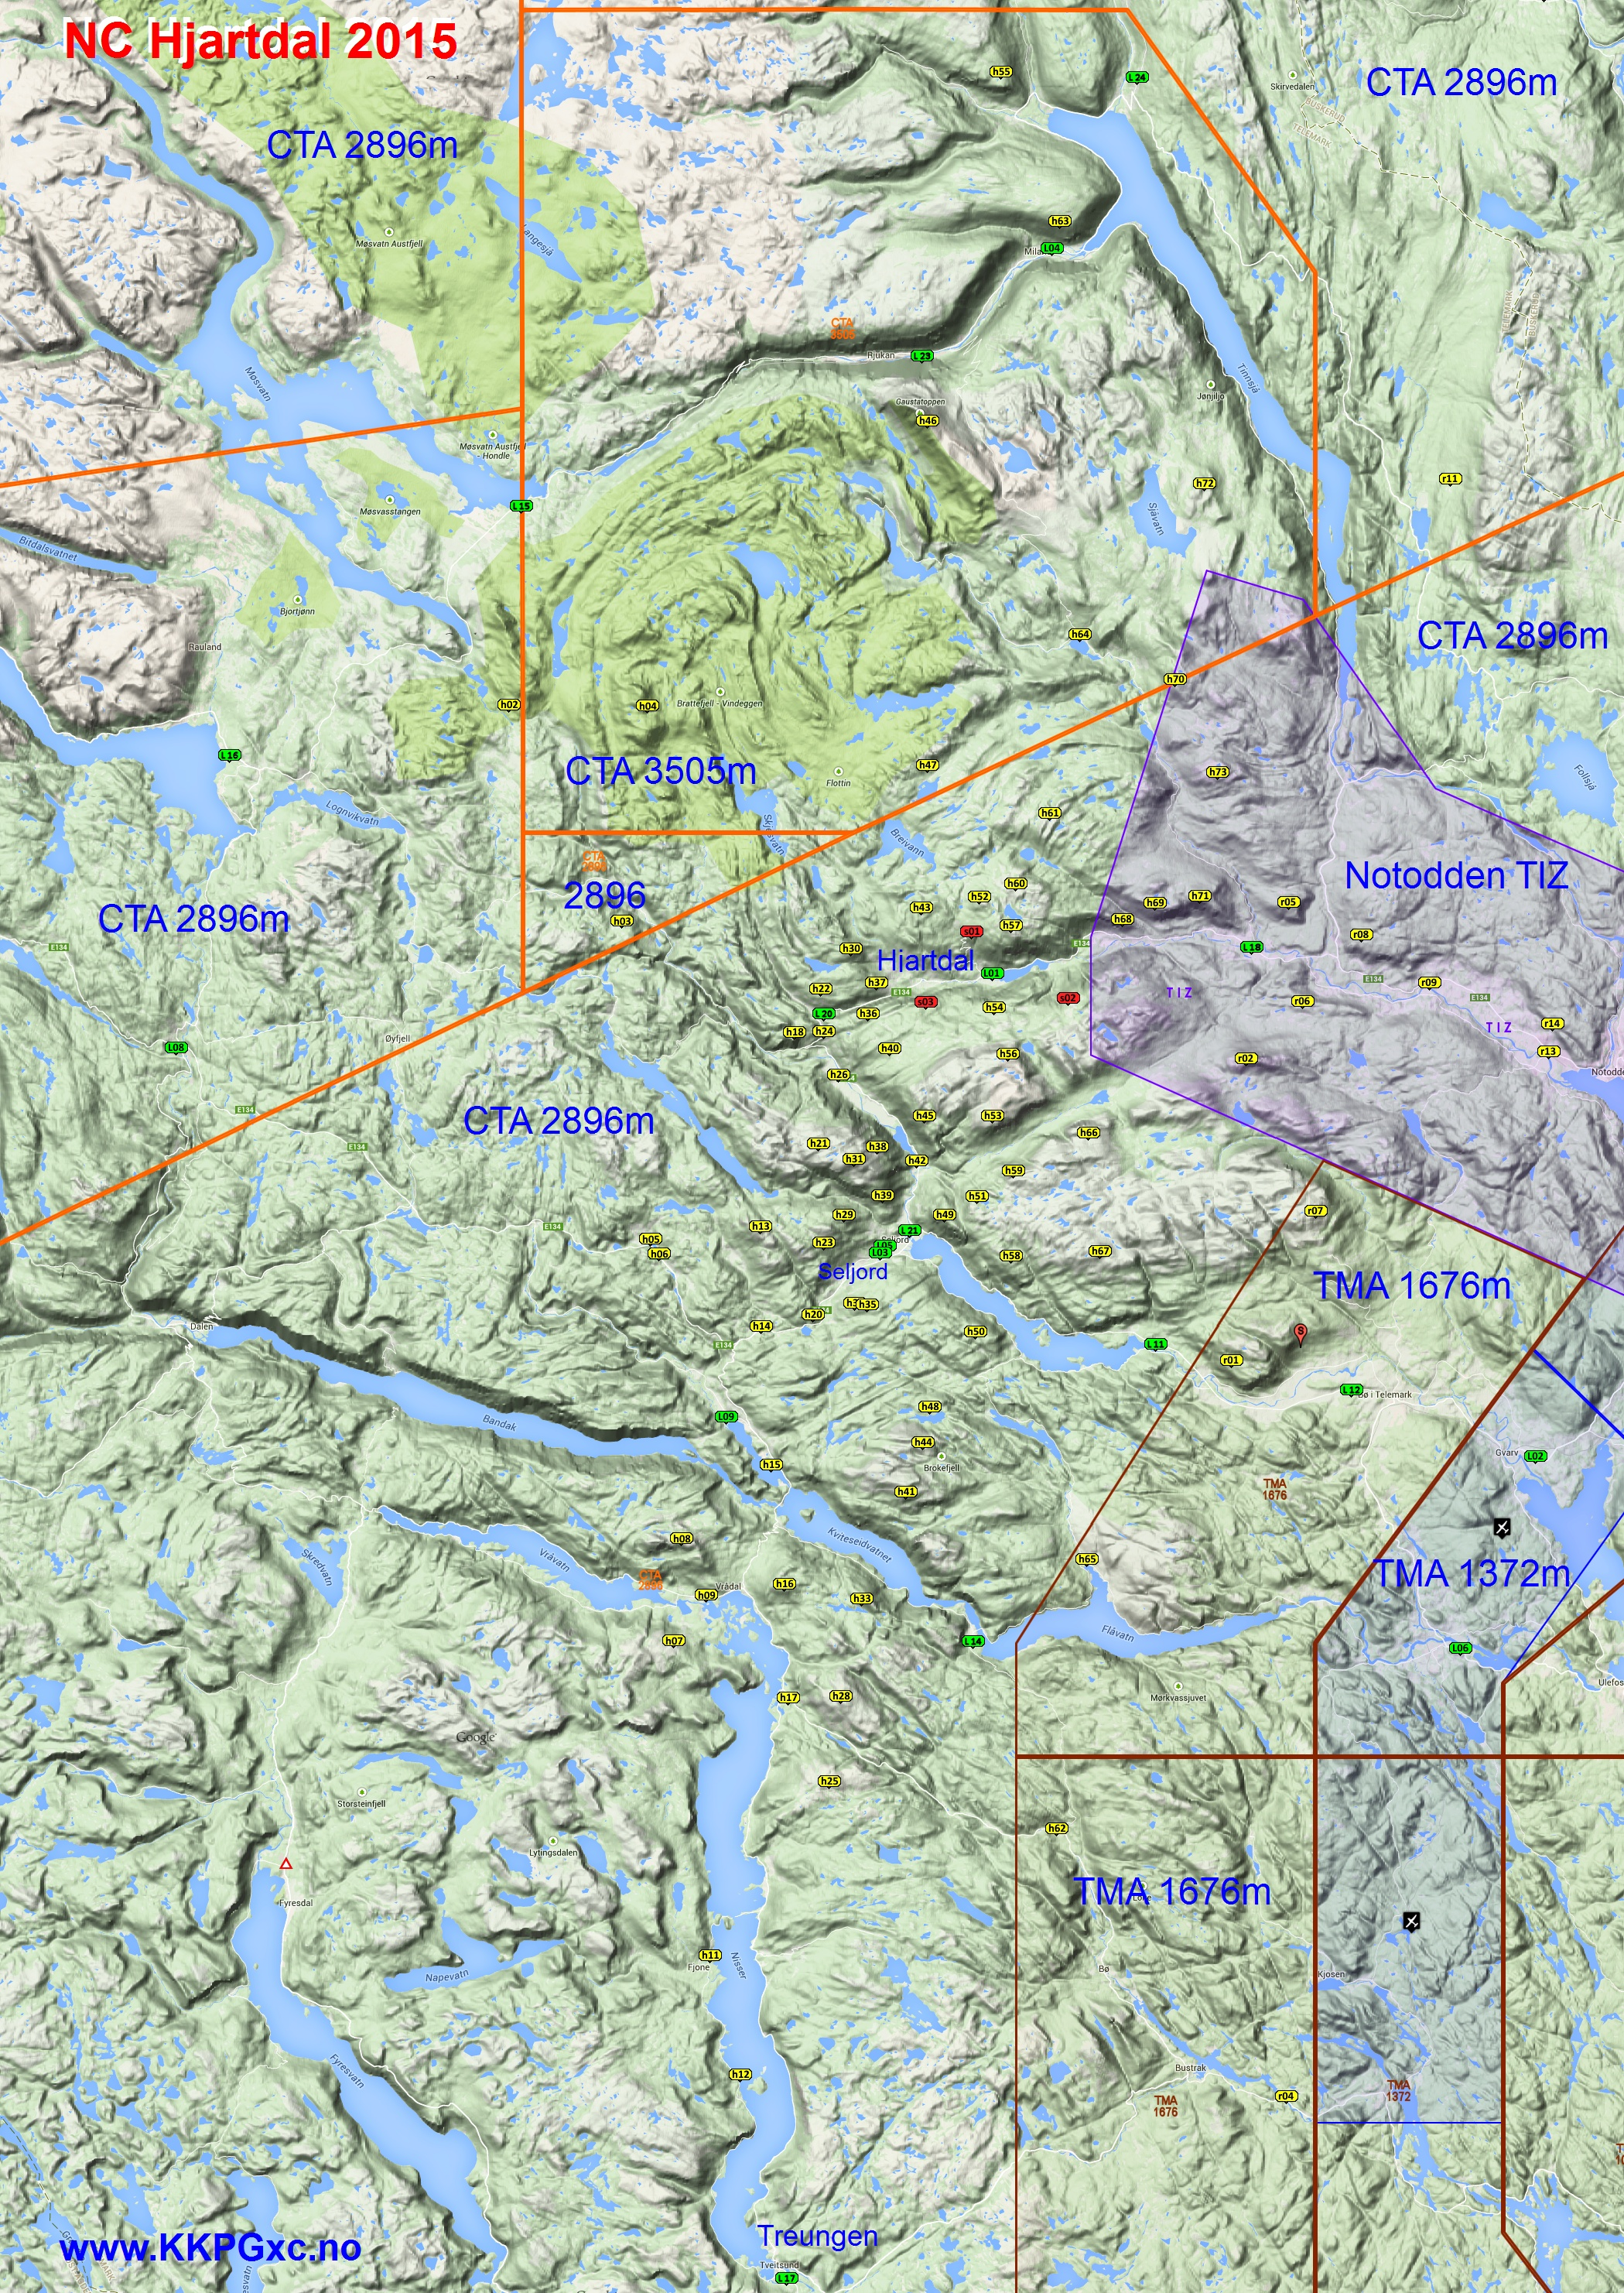 hjartdal kart NC kart til nedlasting og utskrift. :: .KKPGxc.no hjartdal kart